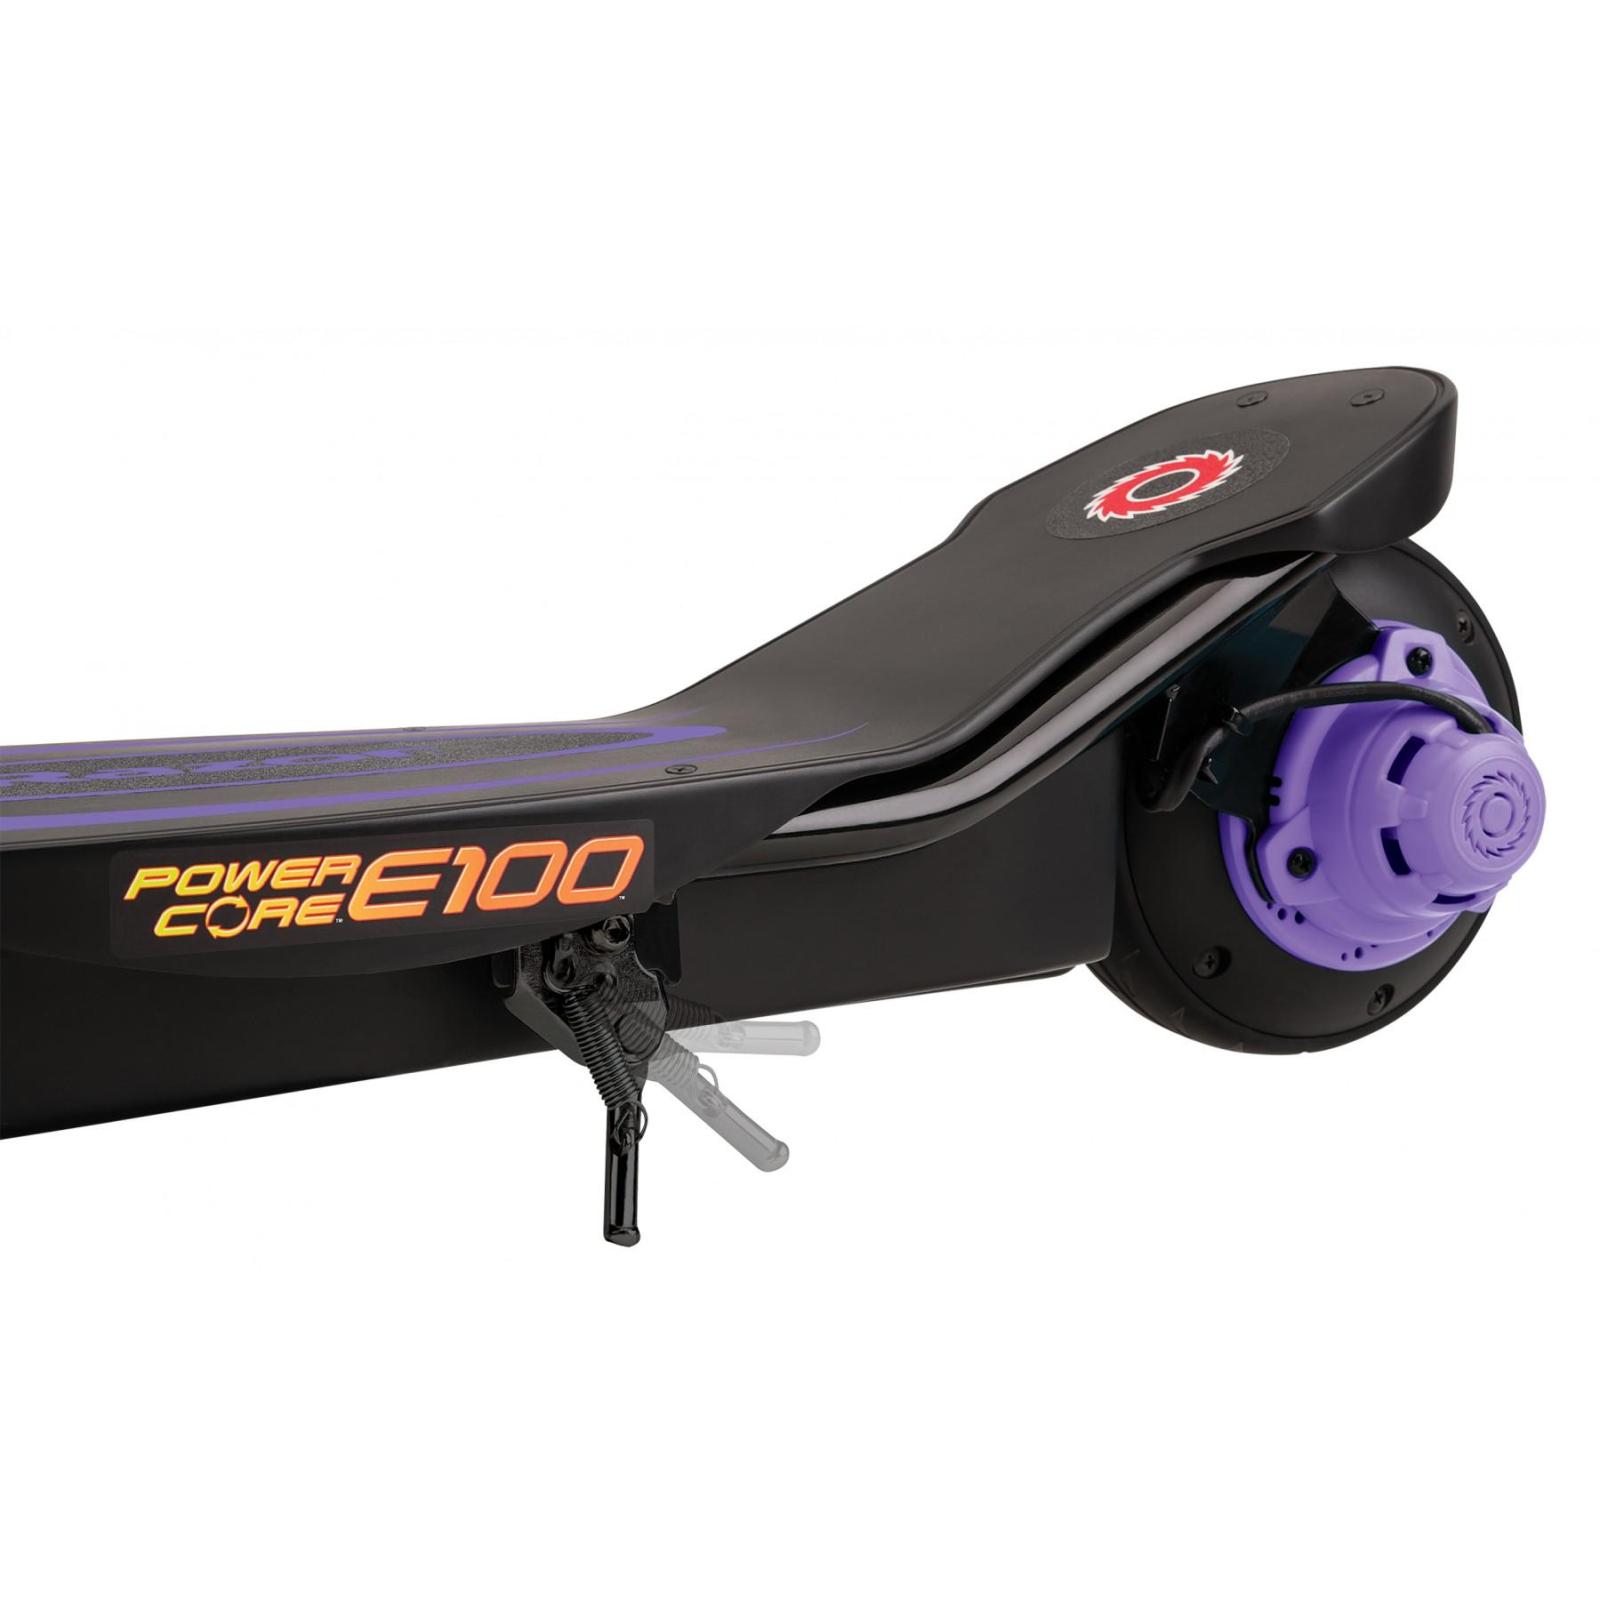 Электросамокат Razor Power Core E100 Purple (283570) изображение 9